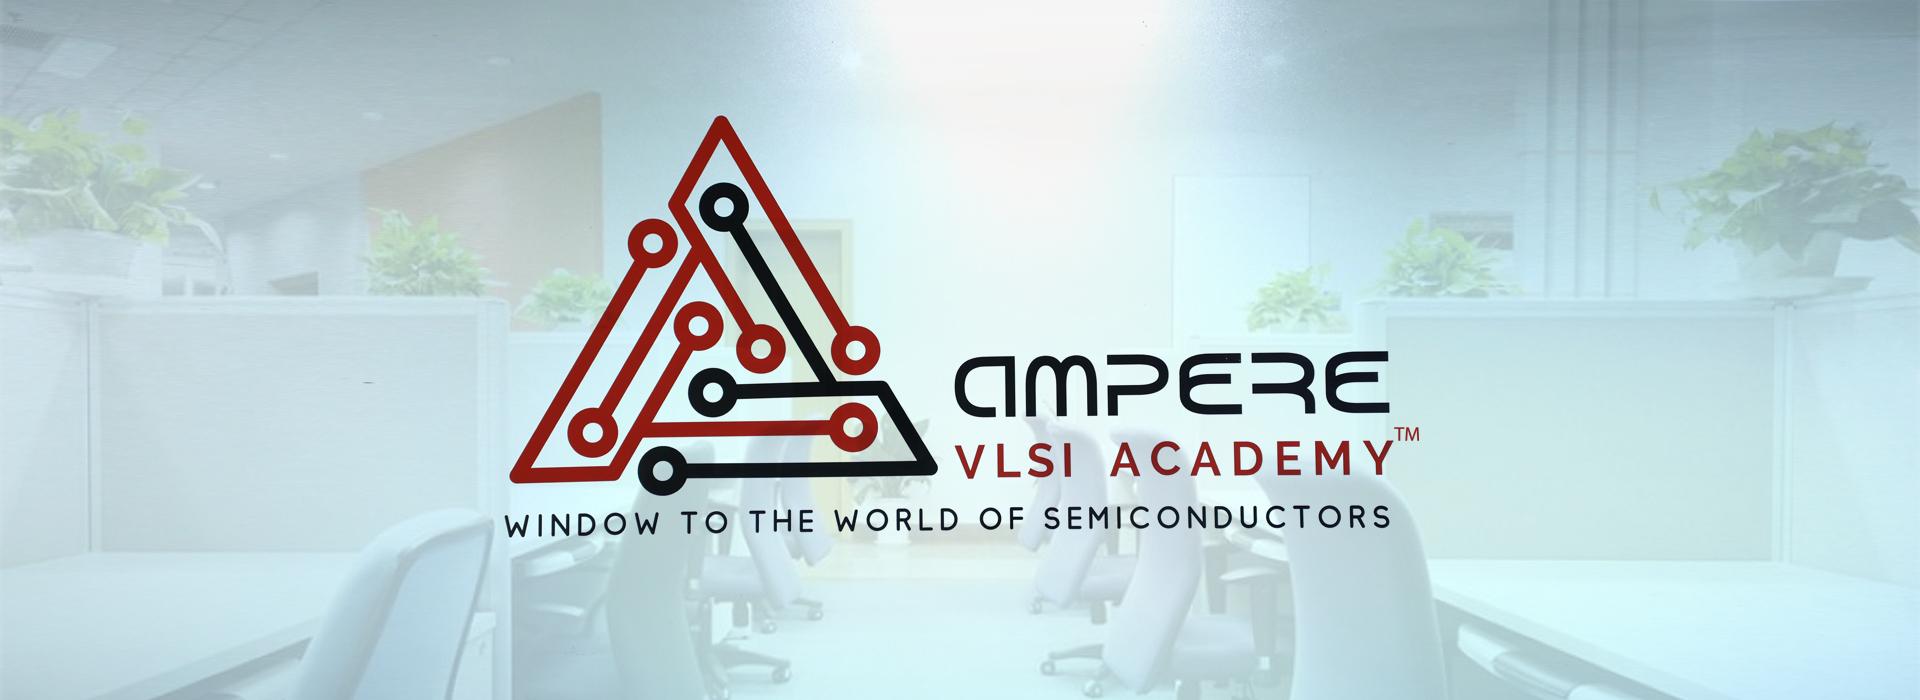 Ampere VLSI Training in Bangalore & Chennai